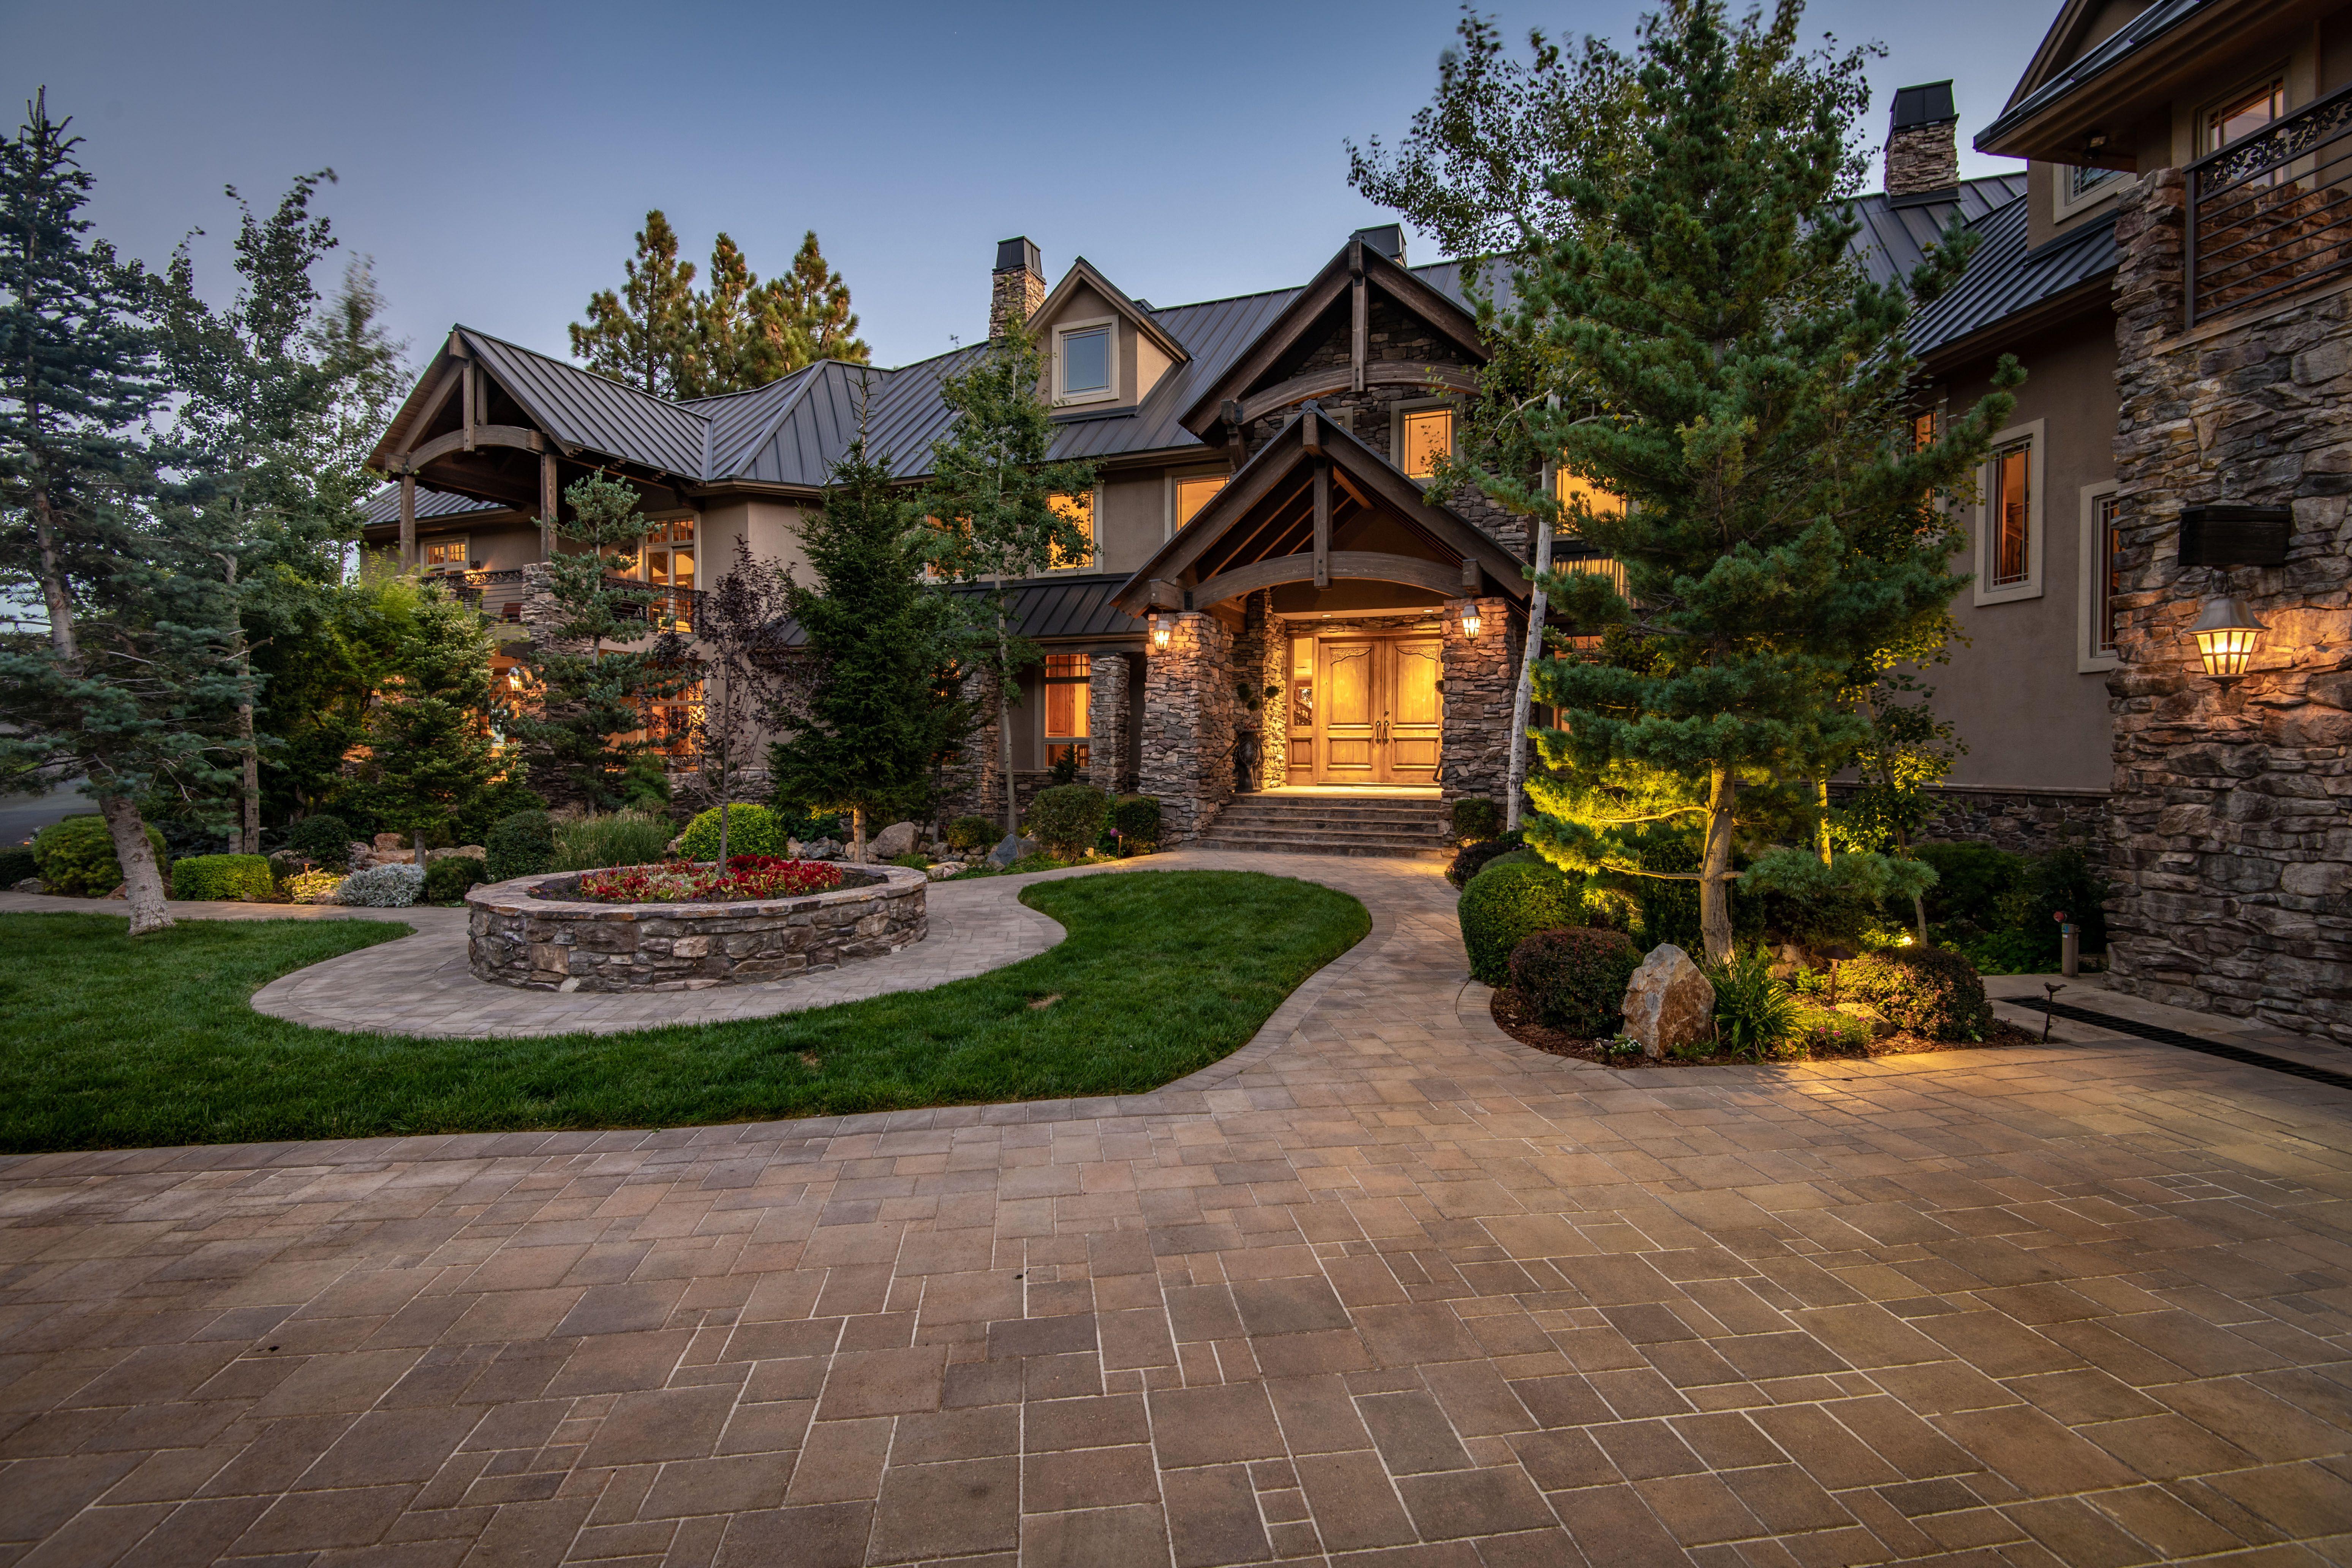 California lottery winner house toptenrealestatedeals